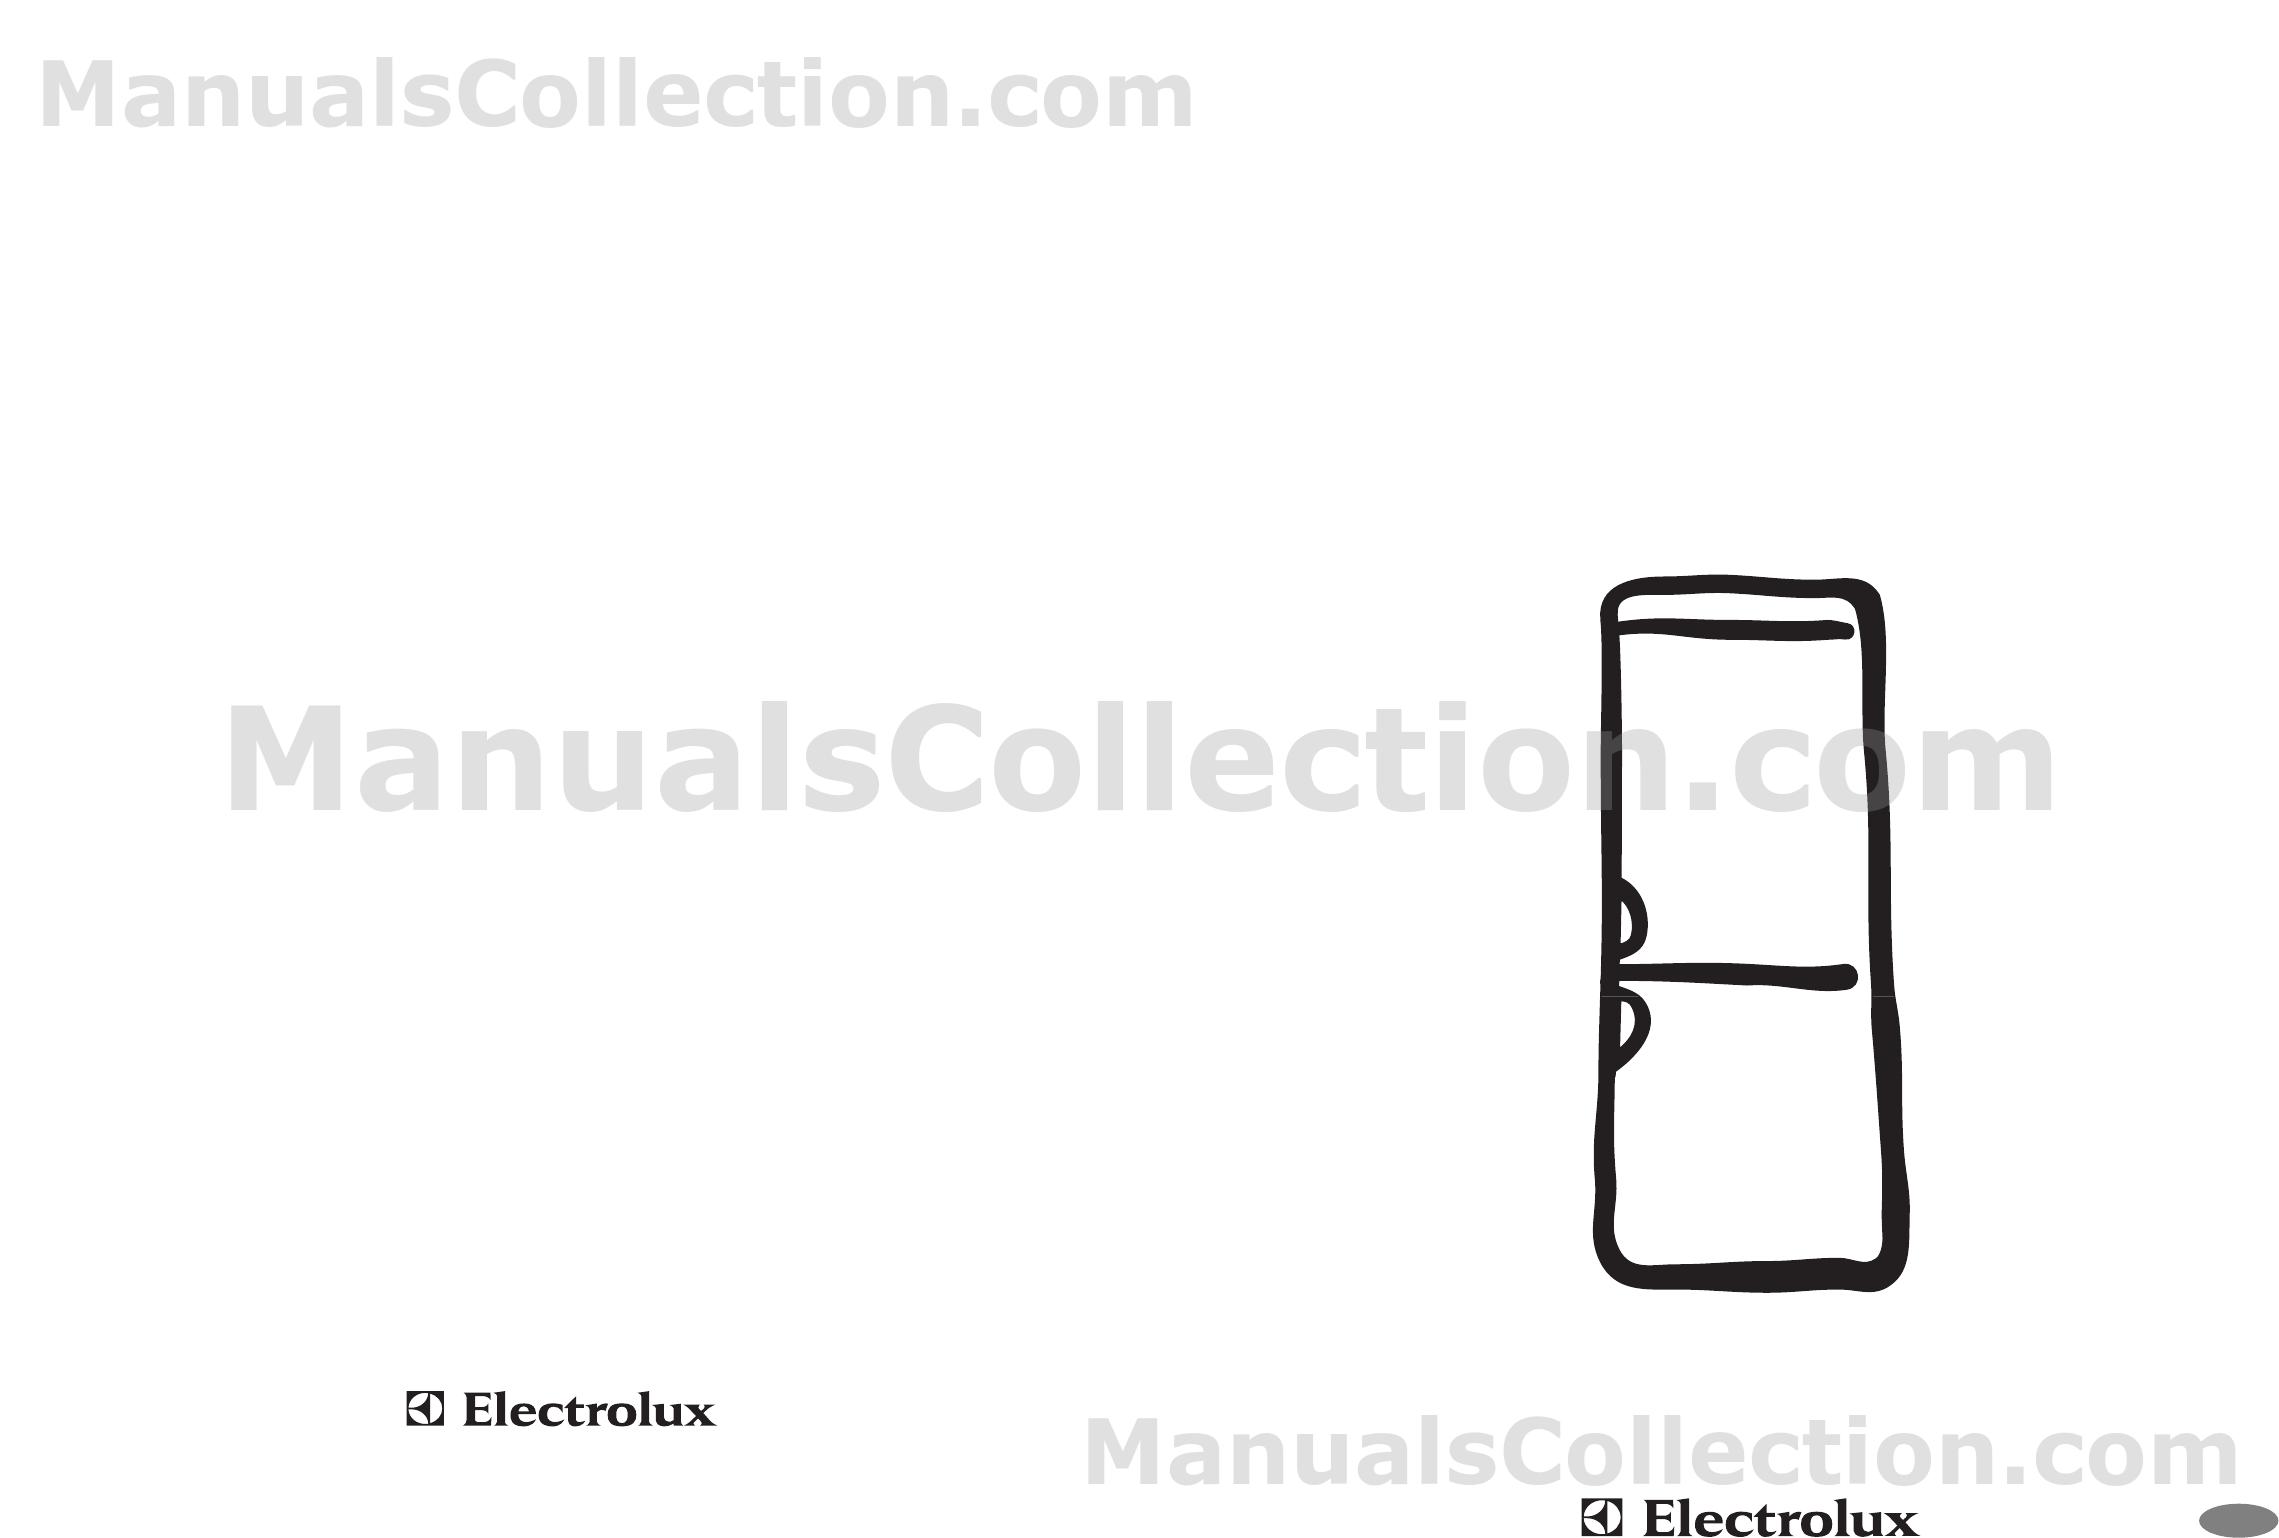 Electrolux ER7831B Manual (Svenska)